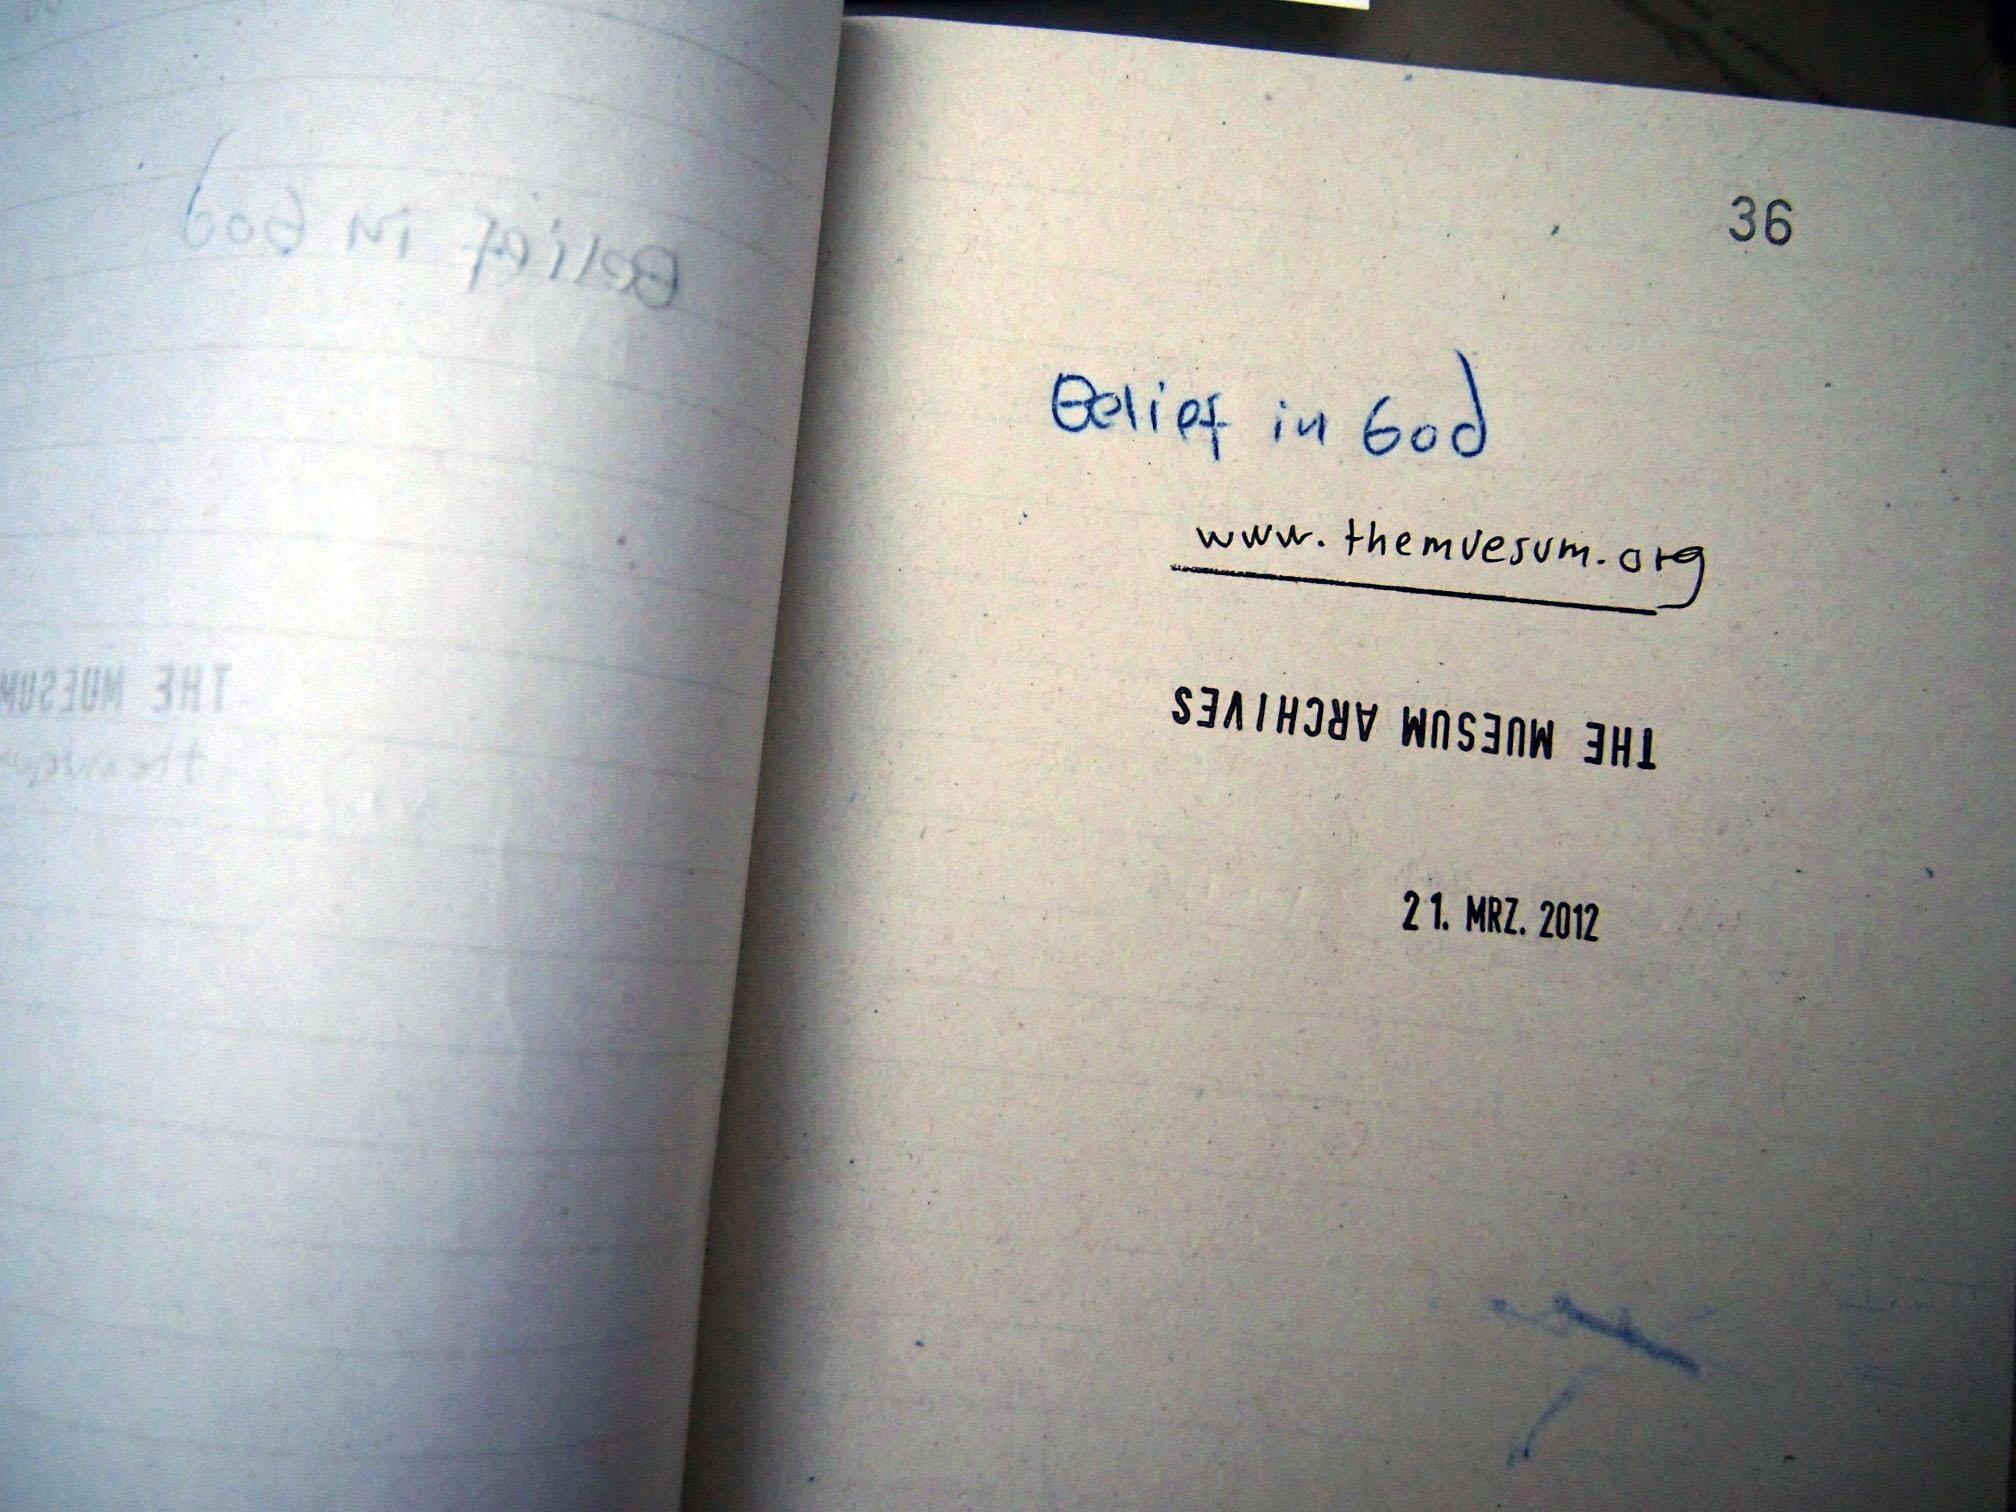 Lost Belief in God. Acknowledge Receipt